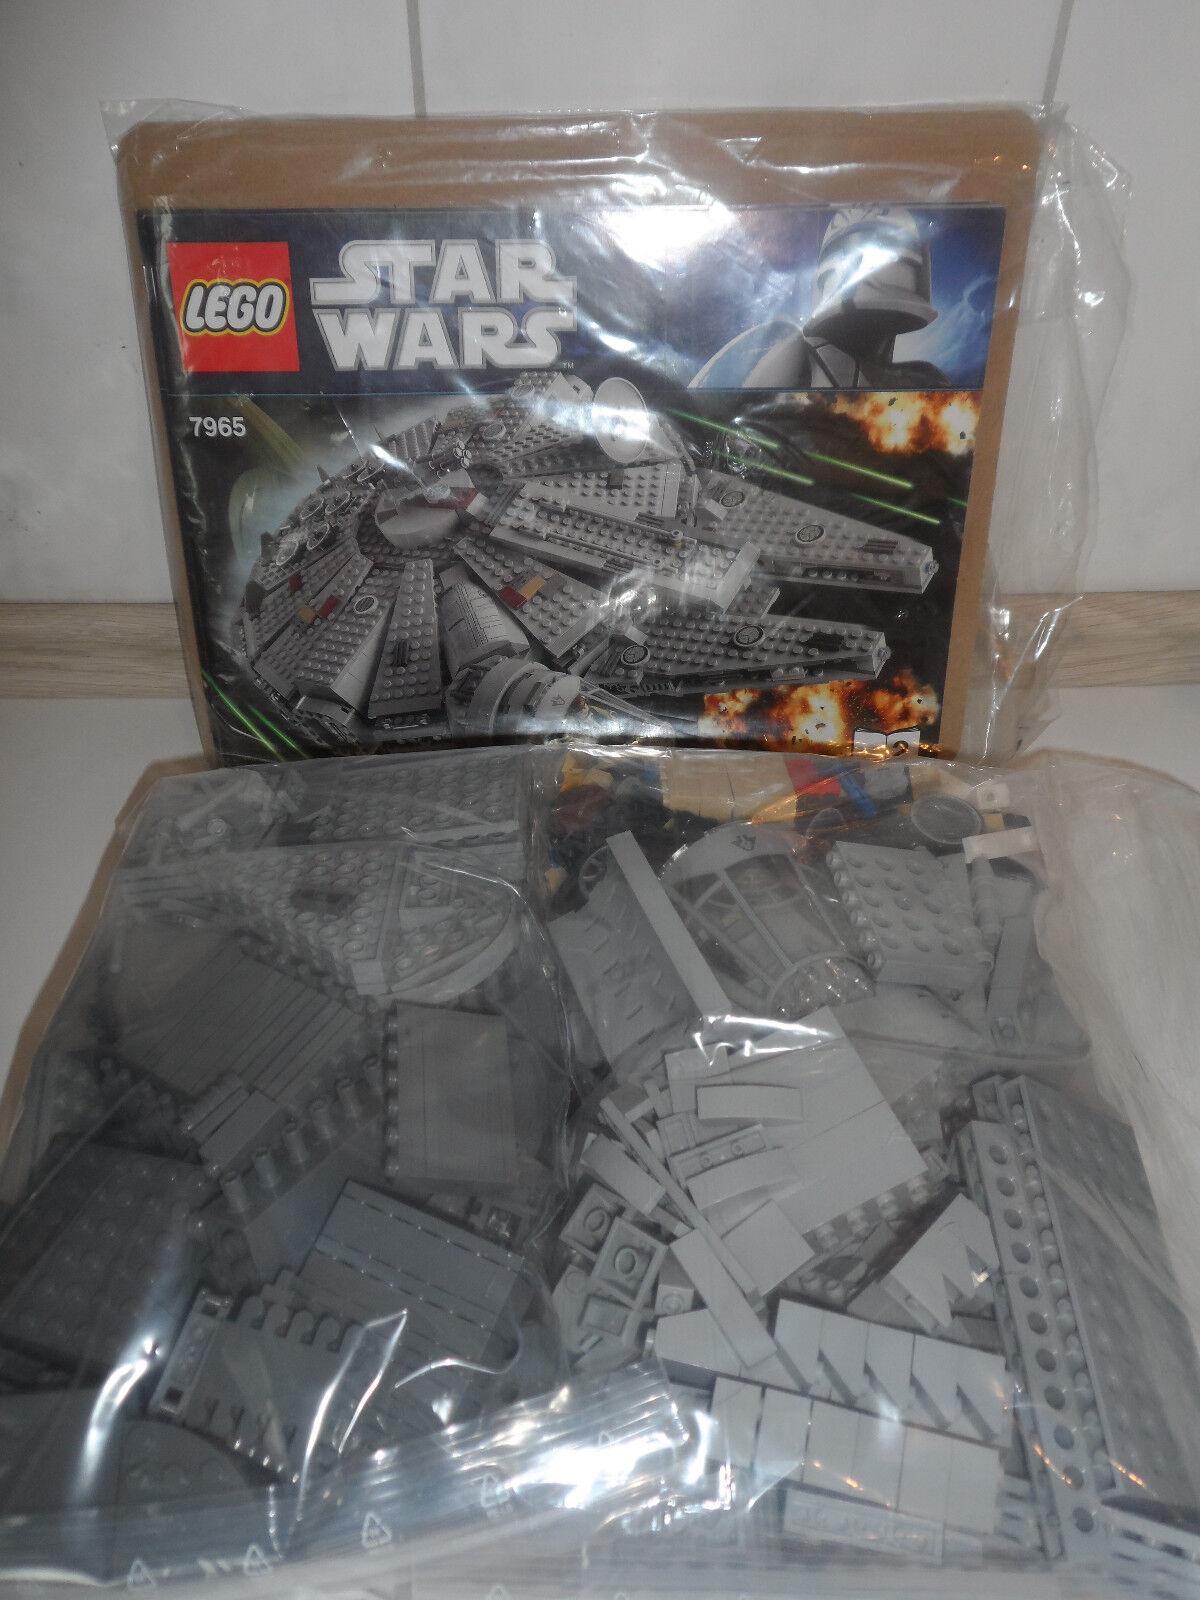 Lego Set 7965 Star Wars Millenium Falcon